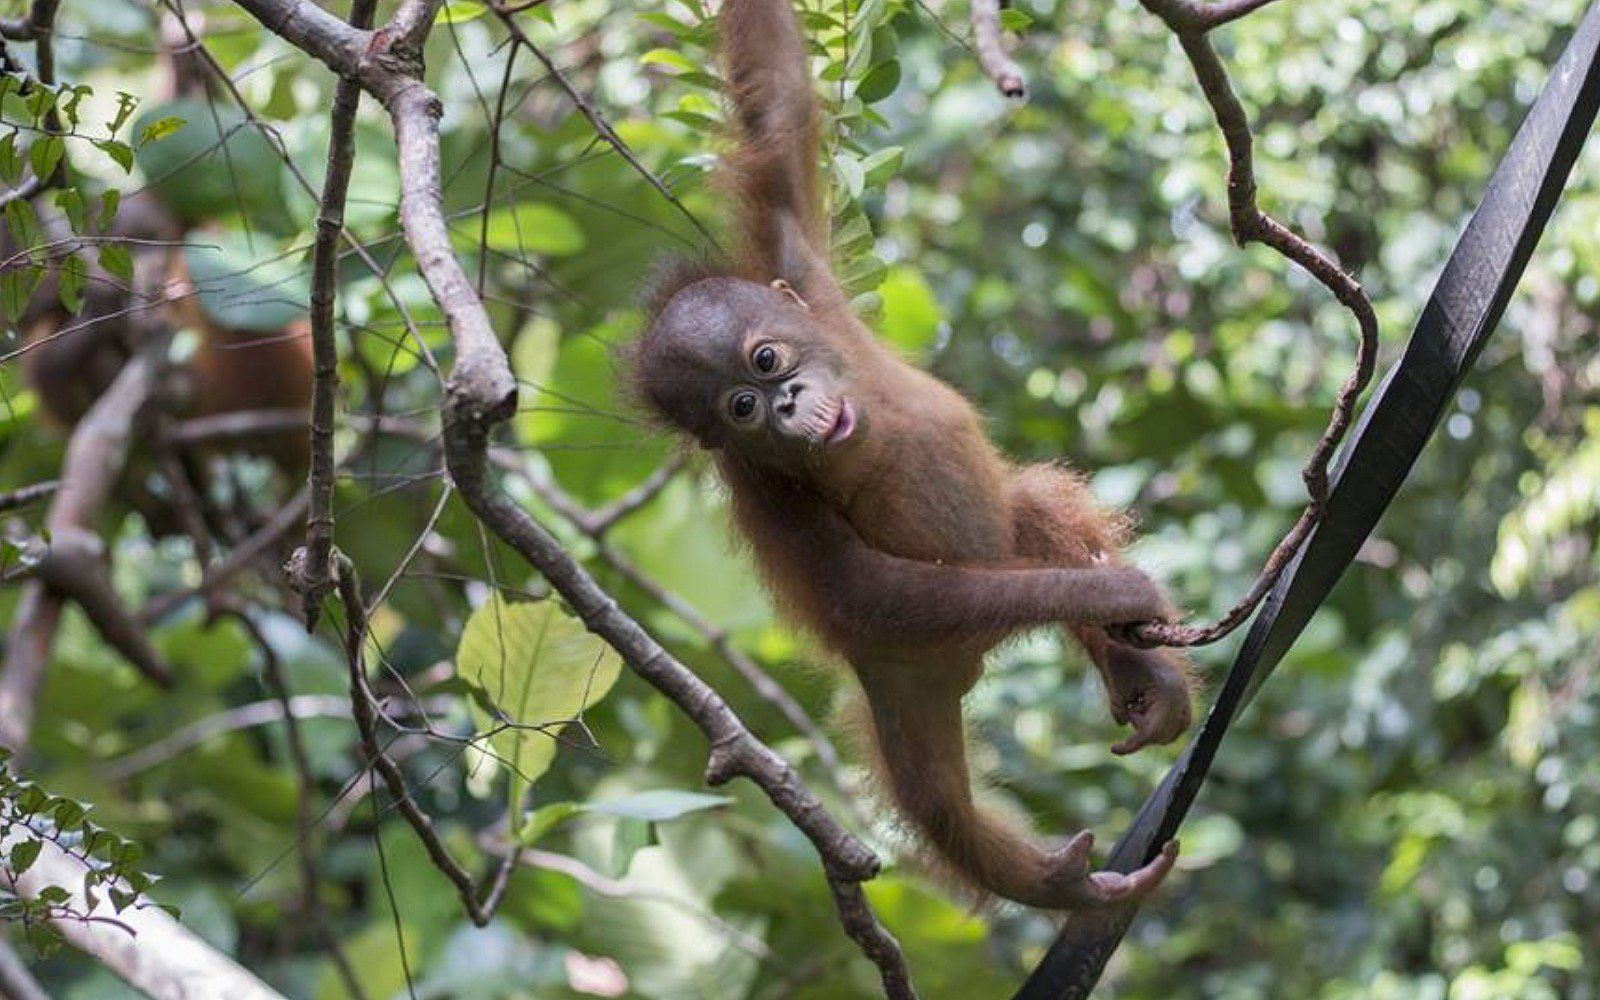 Orphaned Baby Orangutan Who Spent Months as an Illegal Pet ...